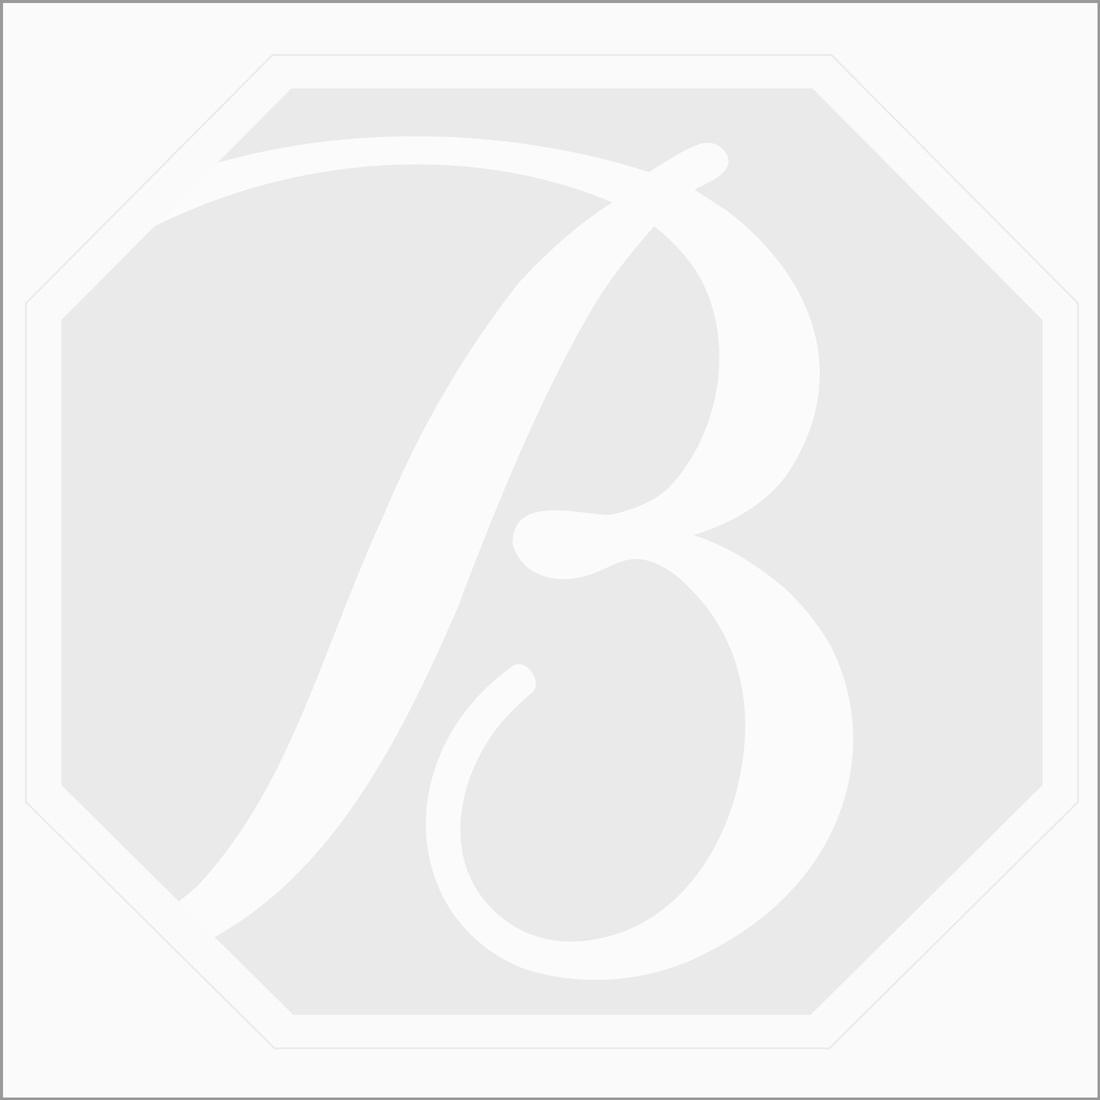 1 Pc - 43.01 ct. -Medium Blue Aquamarine Oval Cabochon - 30.9 x 16.8 x 12.9 mm (AQCAB1094)